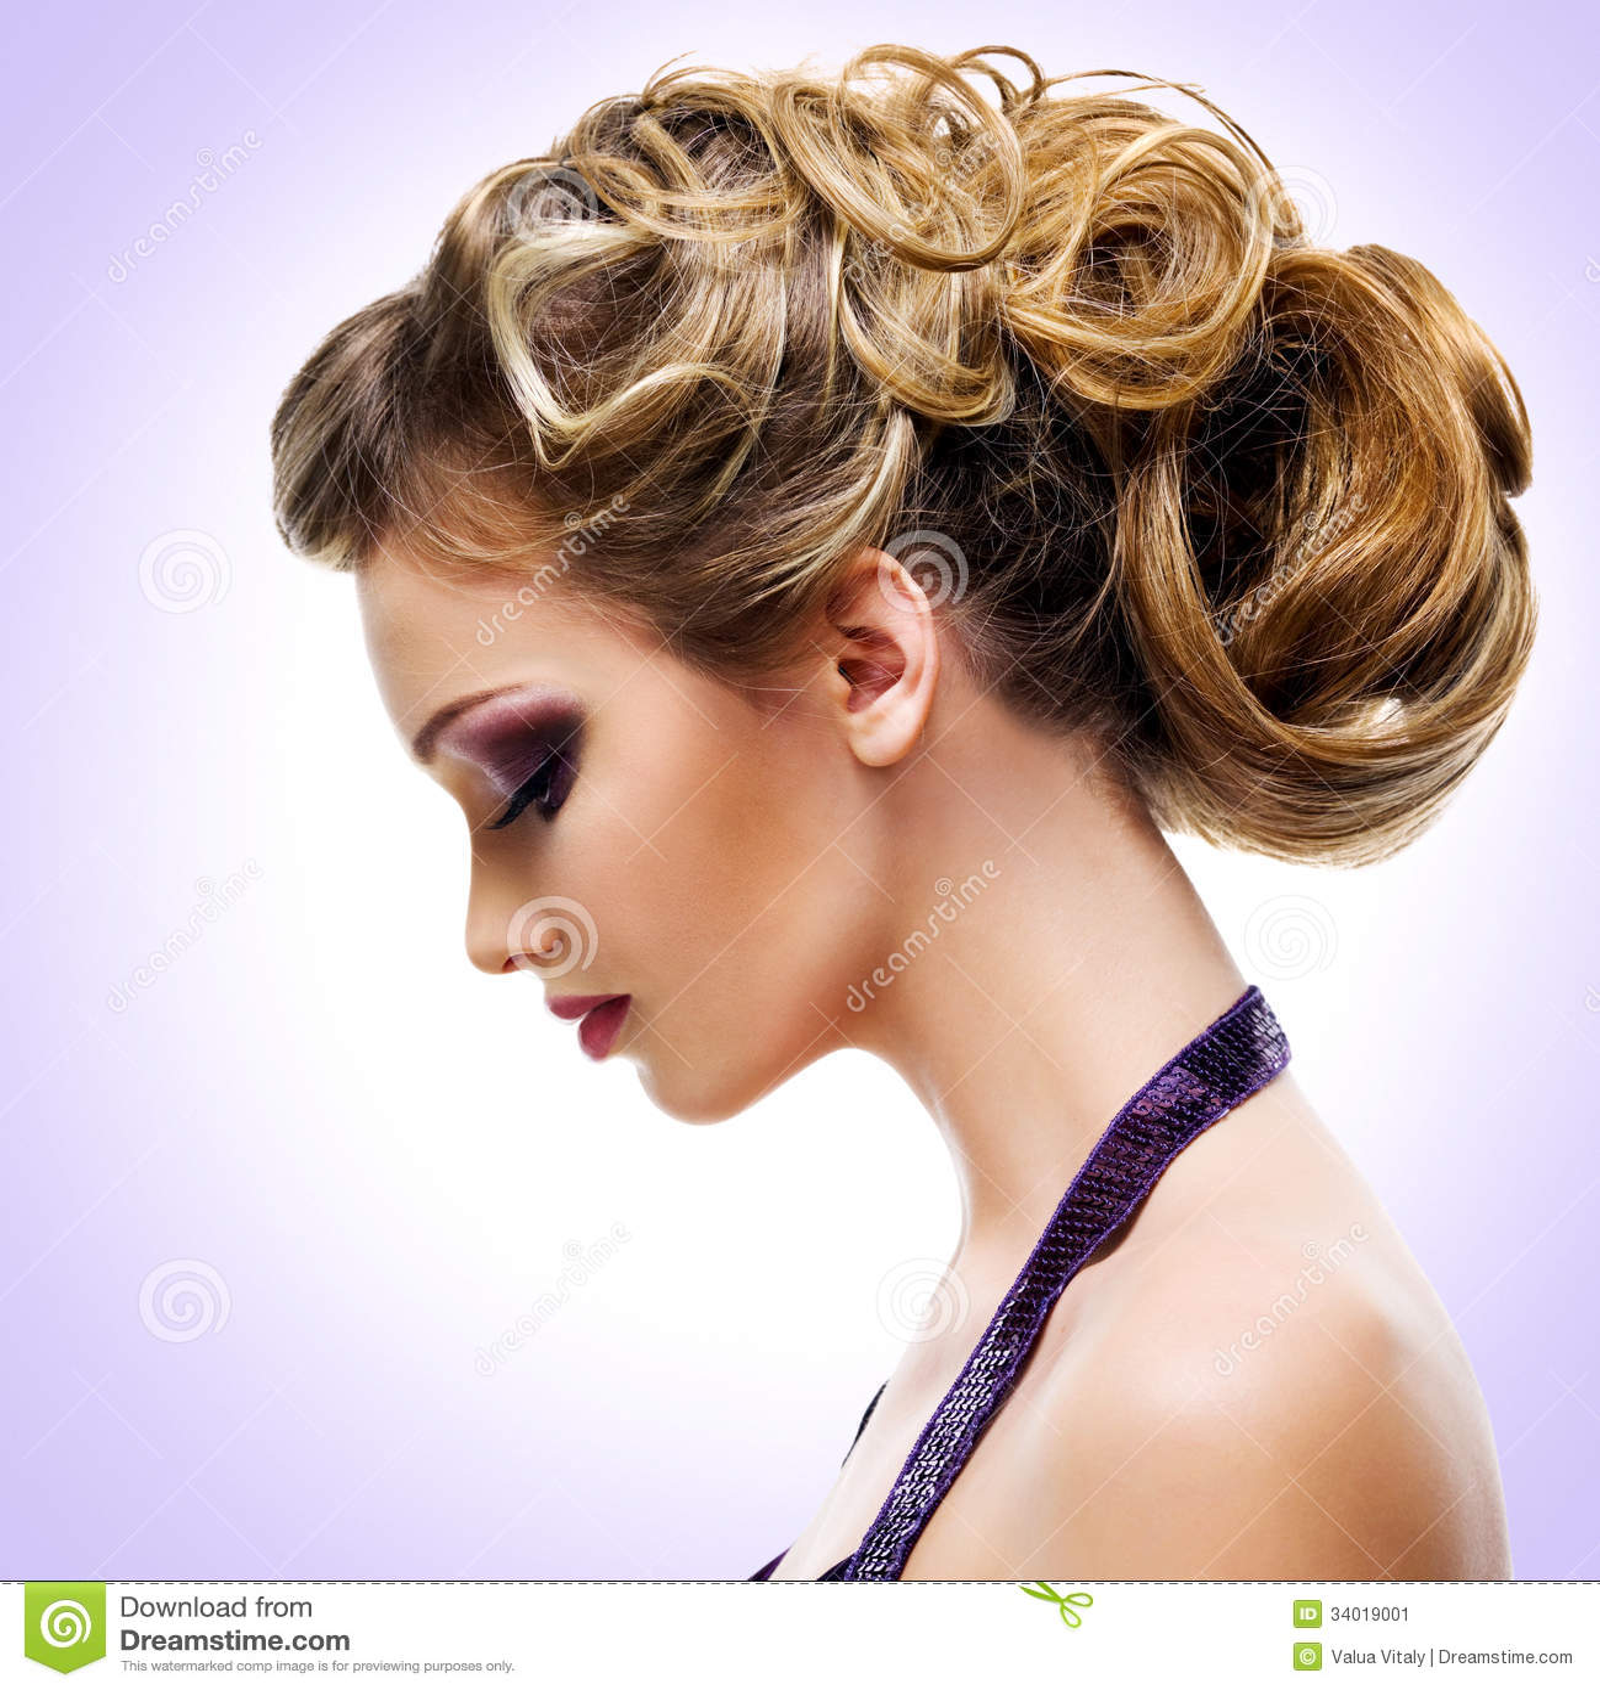 hairstyle background - photo #22